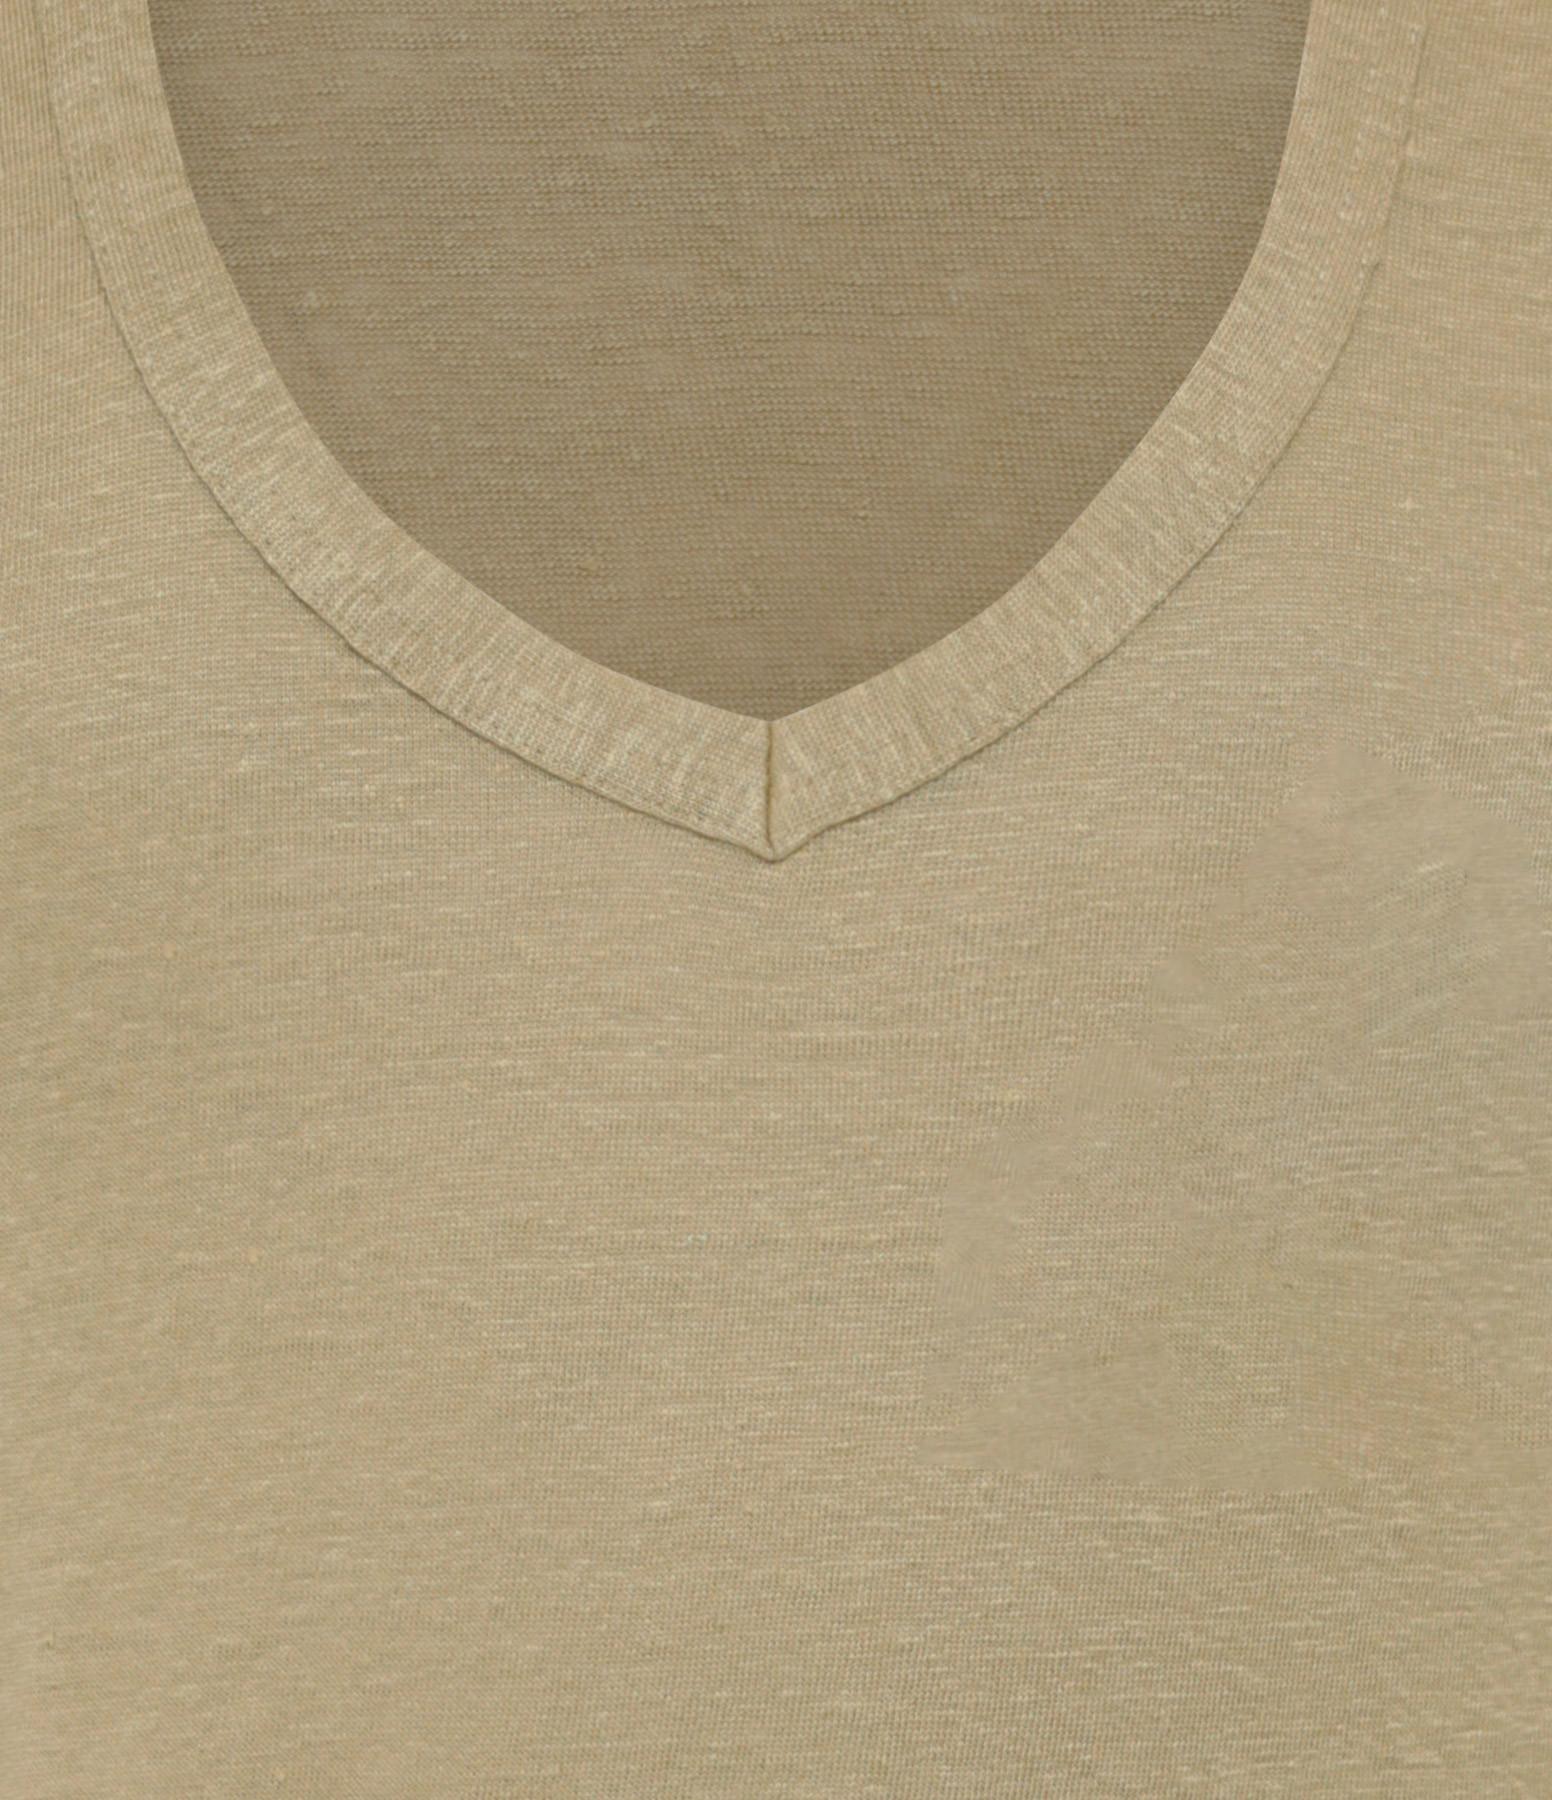 ISABEL MARANT ÉTOILE - Tee-shirt Zankou Lin Kaki